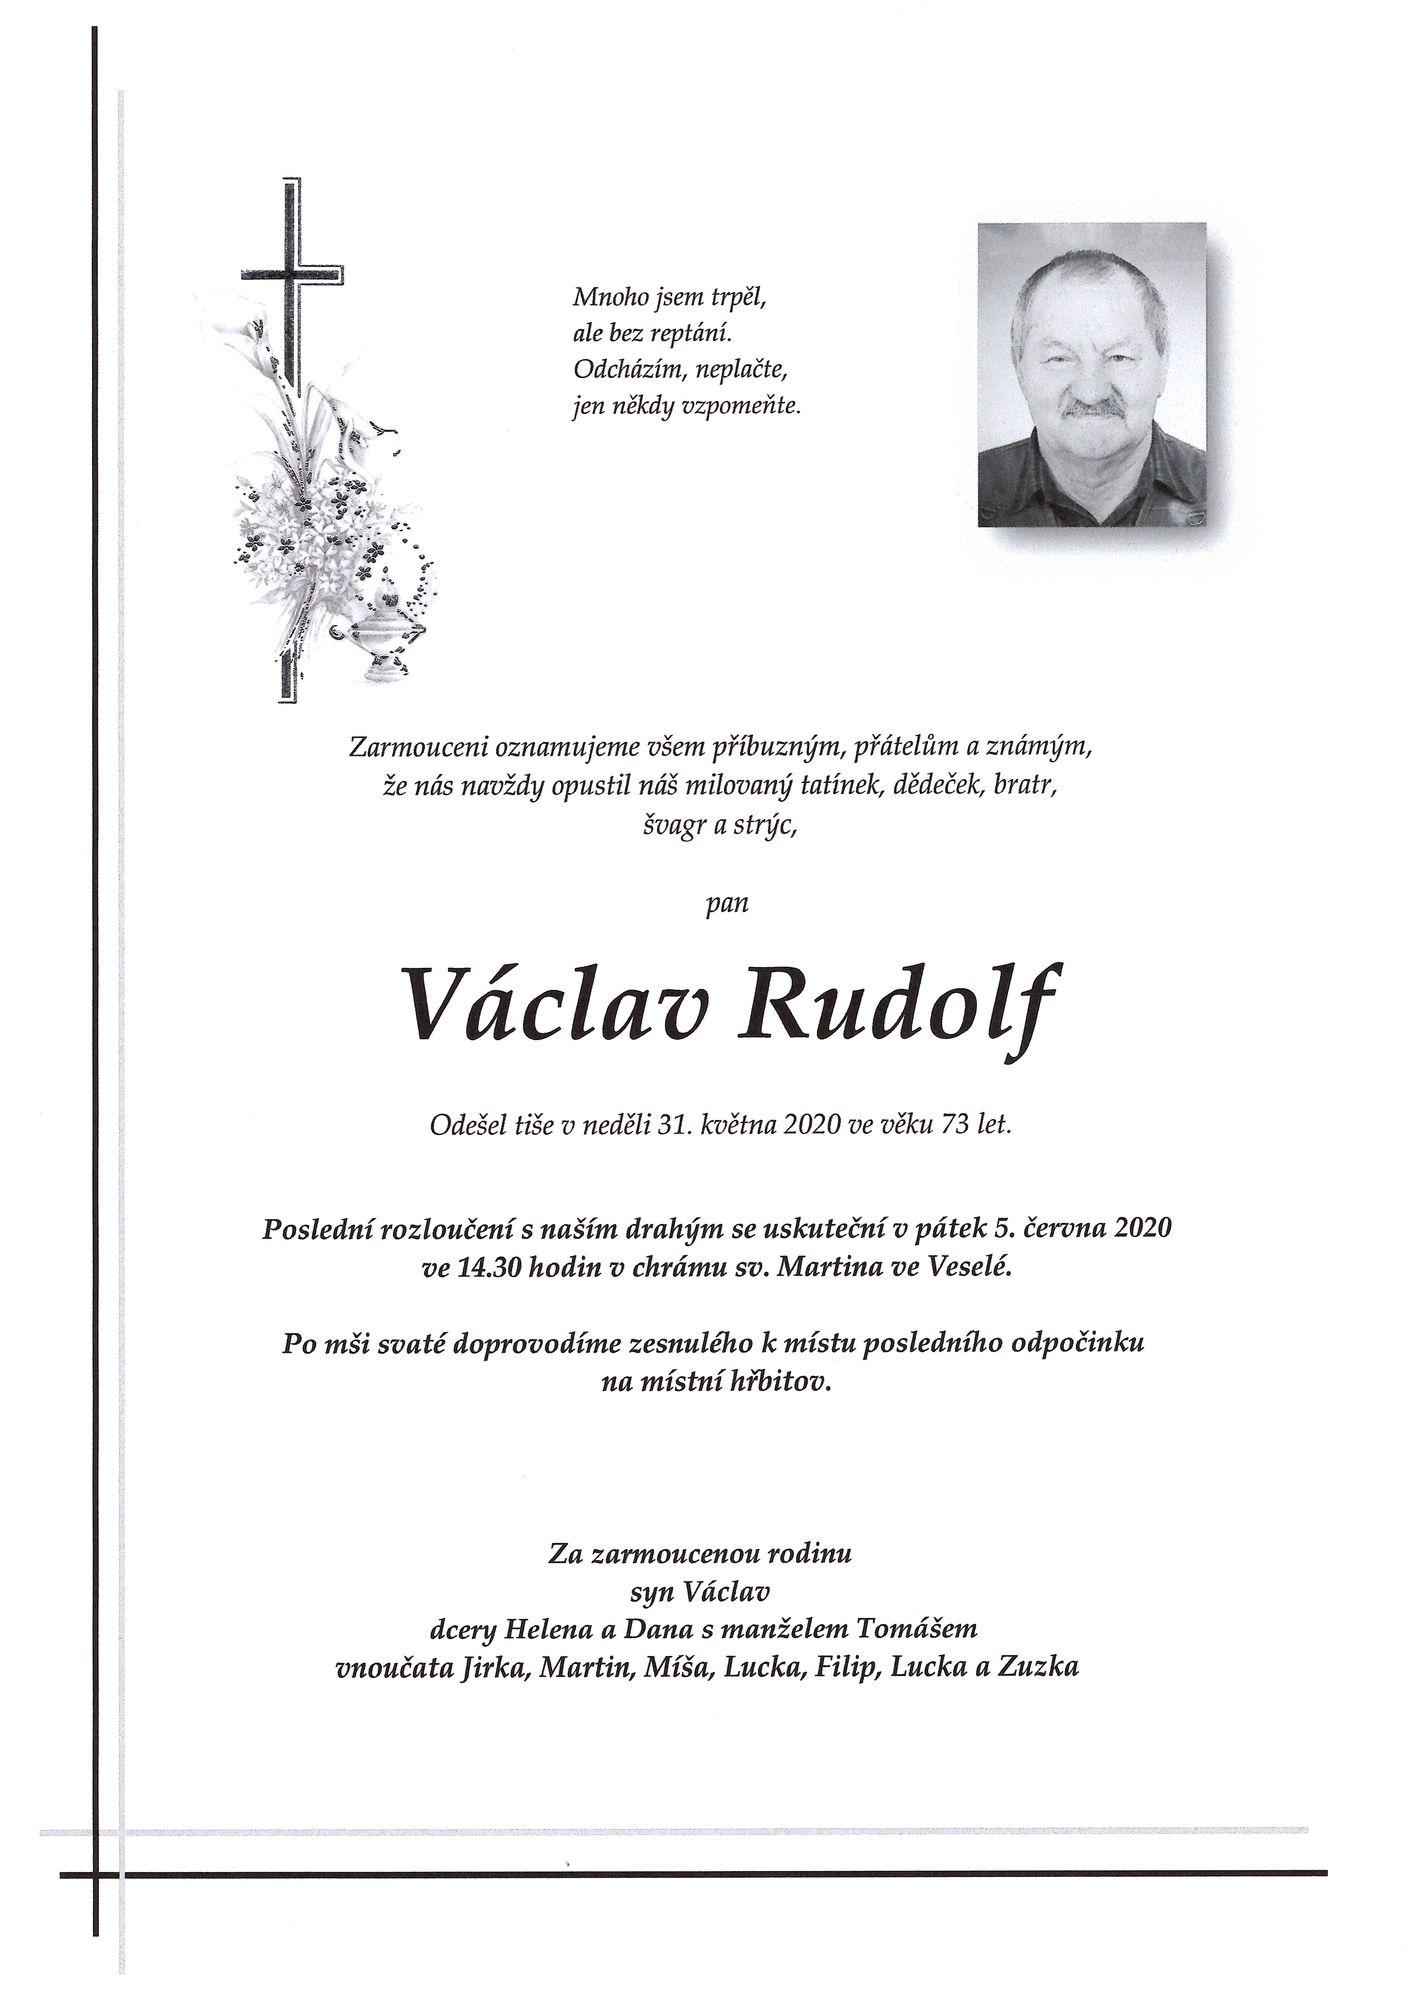 Václav Rudolf